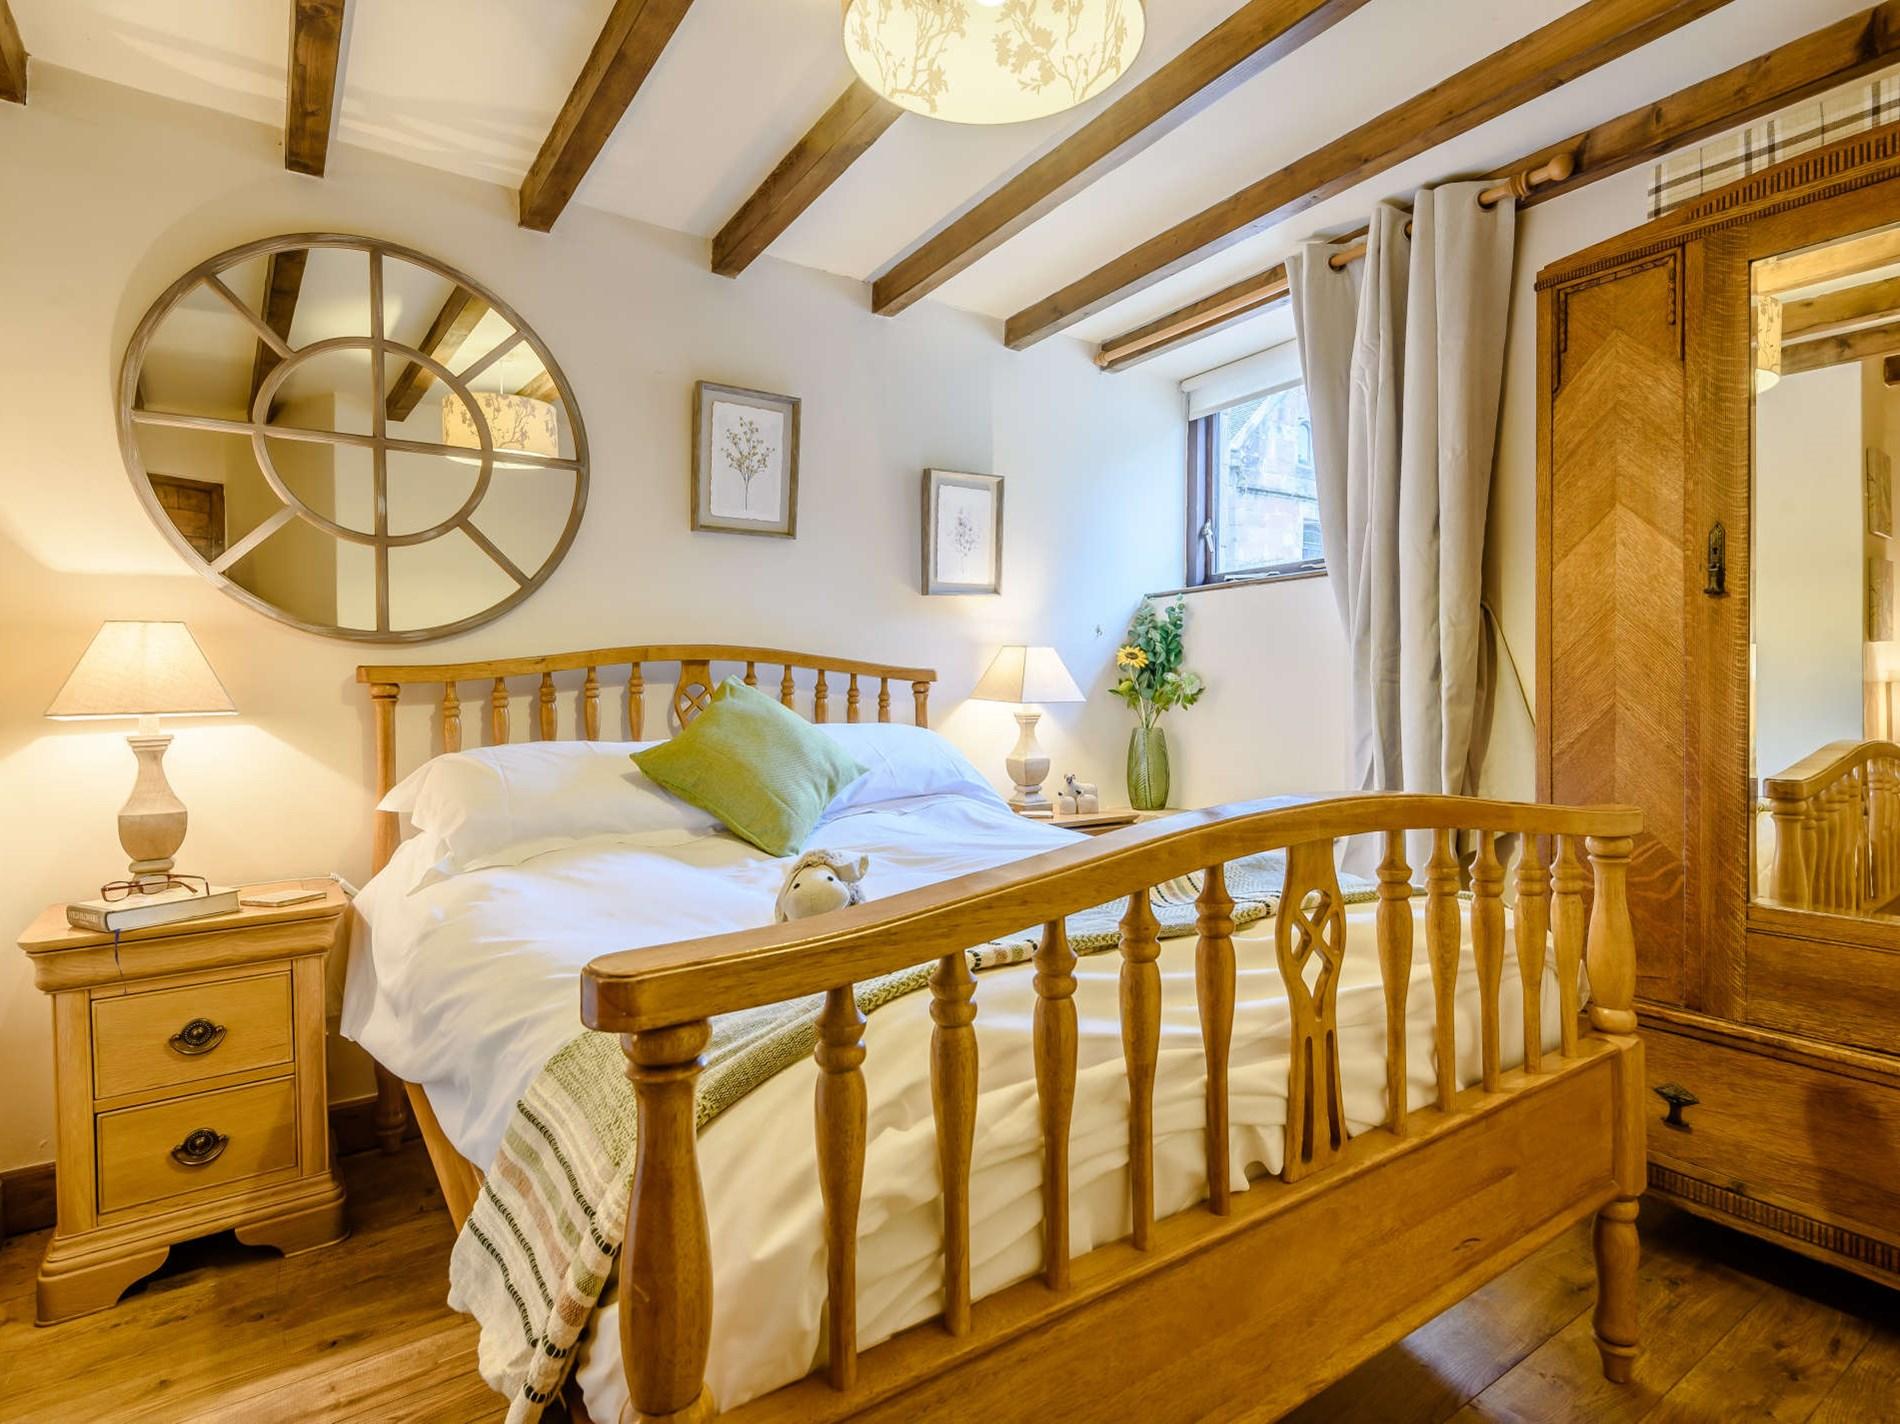 2 Bedroom Barn in Derbyshire, Peak District